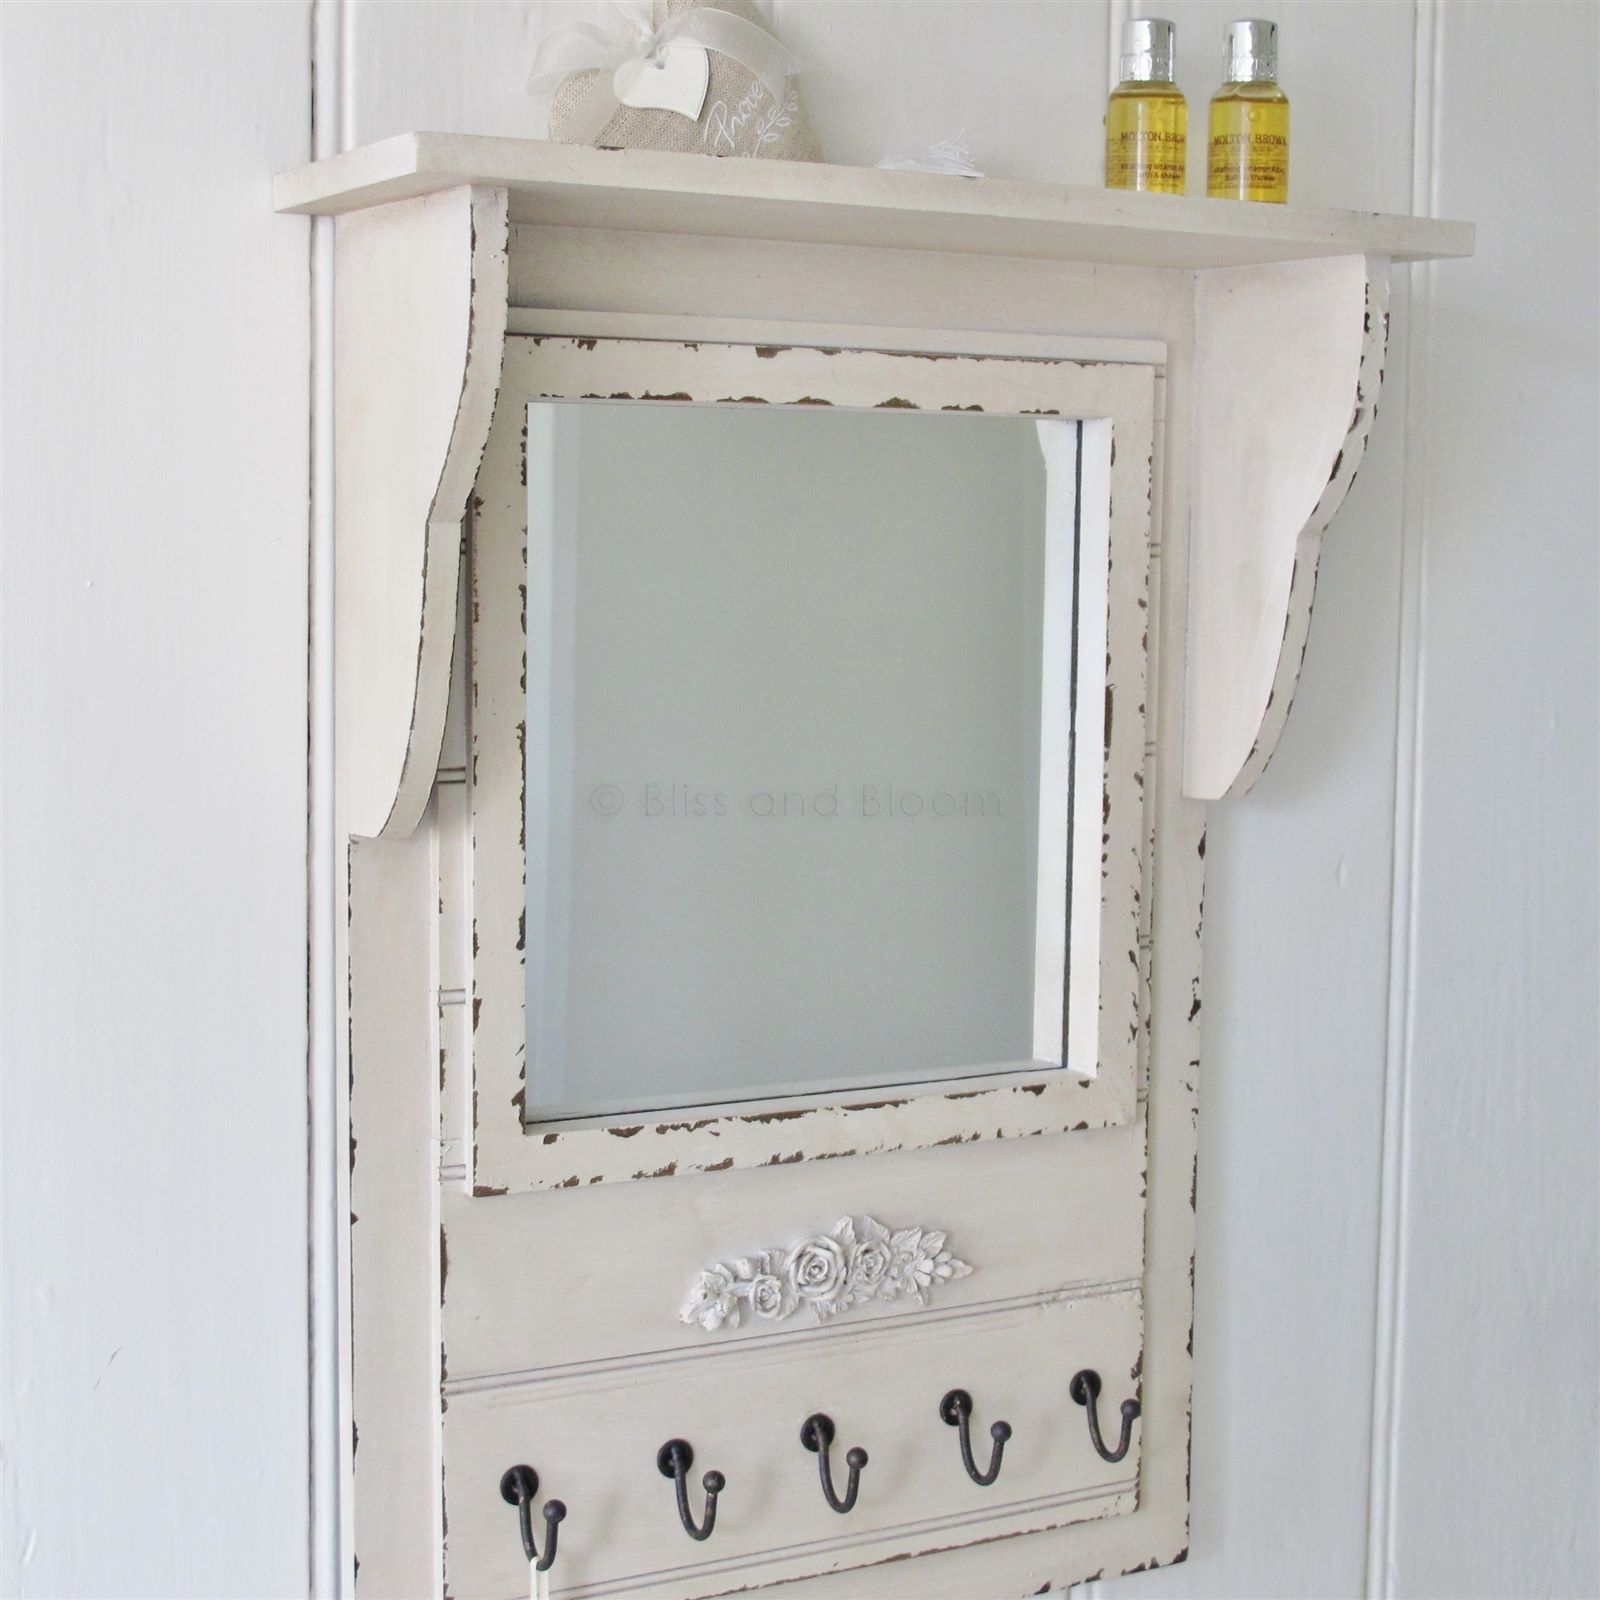 Mirrored Wall Shelf With Hooks